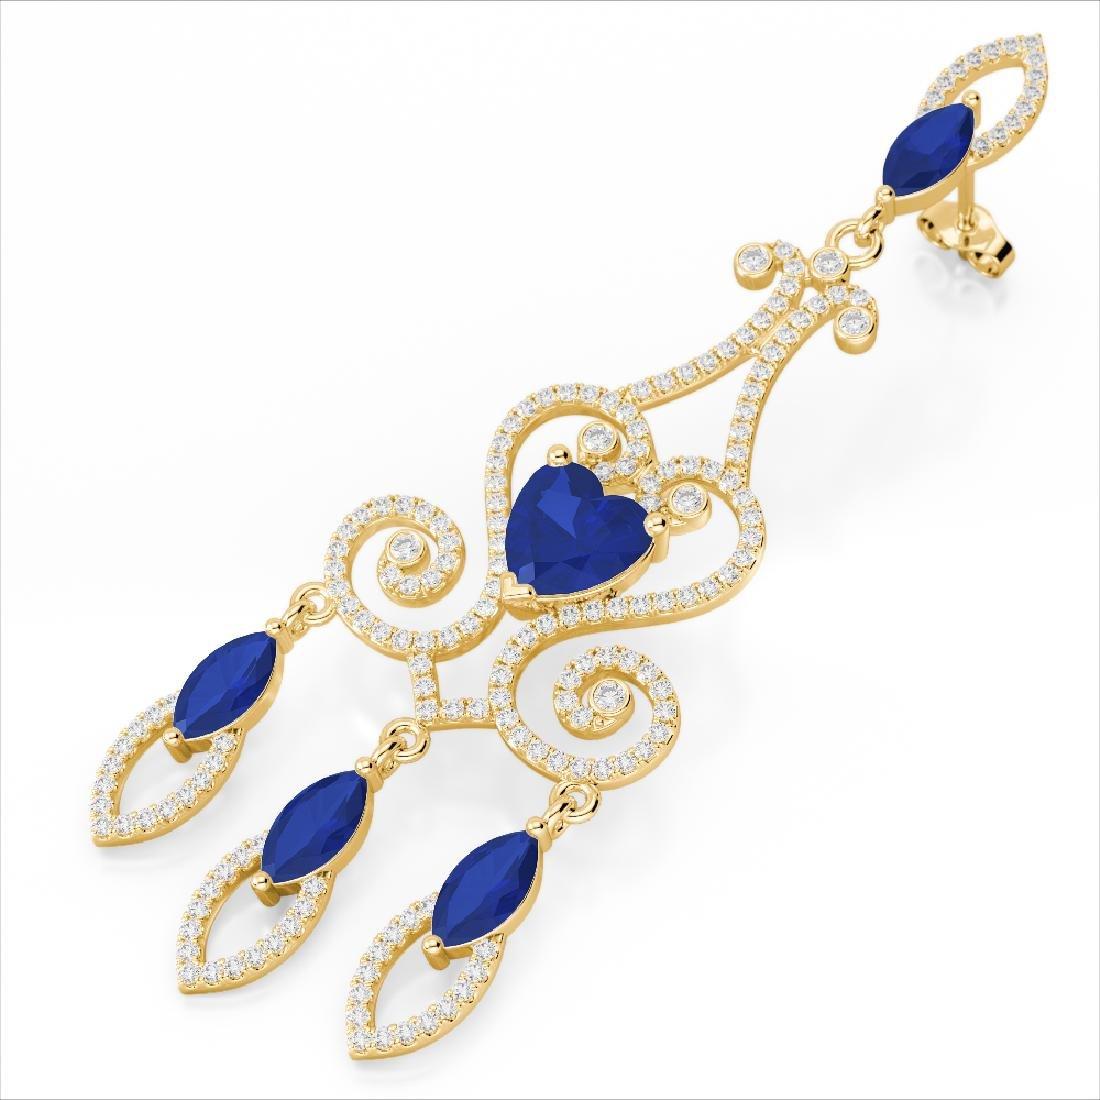 11 CTW Sapphire & Micro Pave VS/SI Diamond Earrings 14K